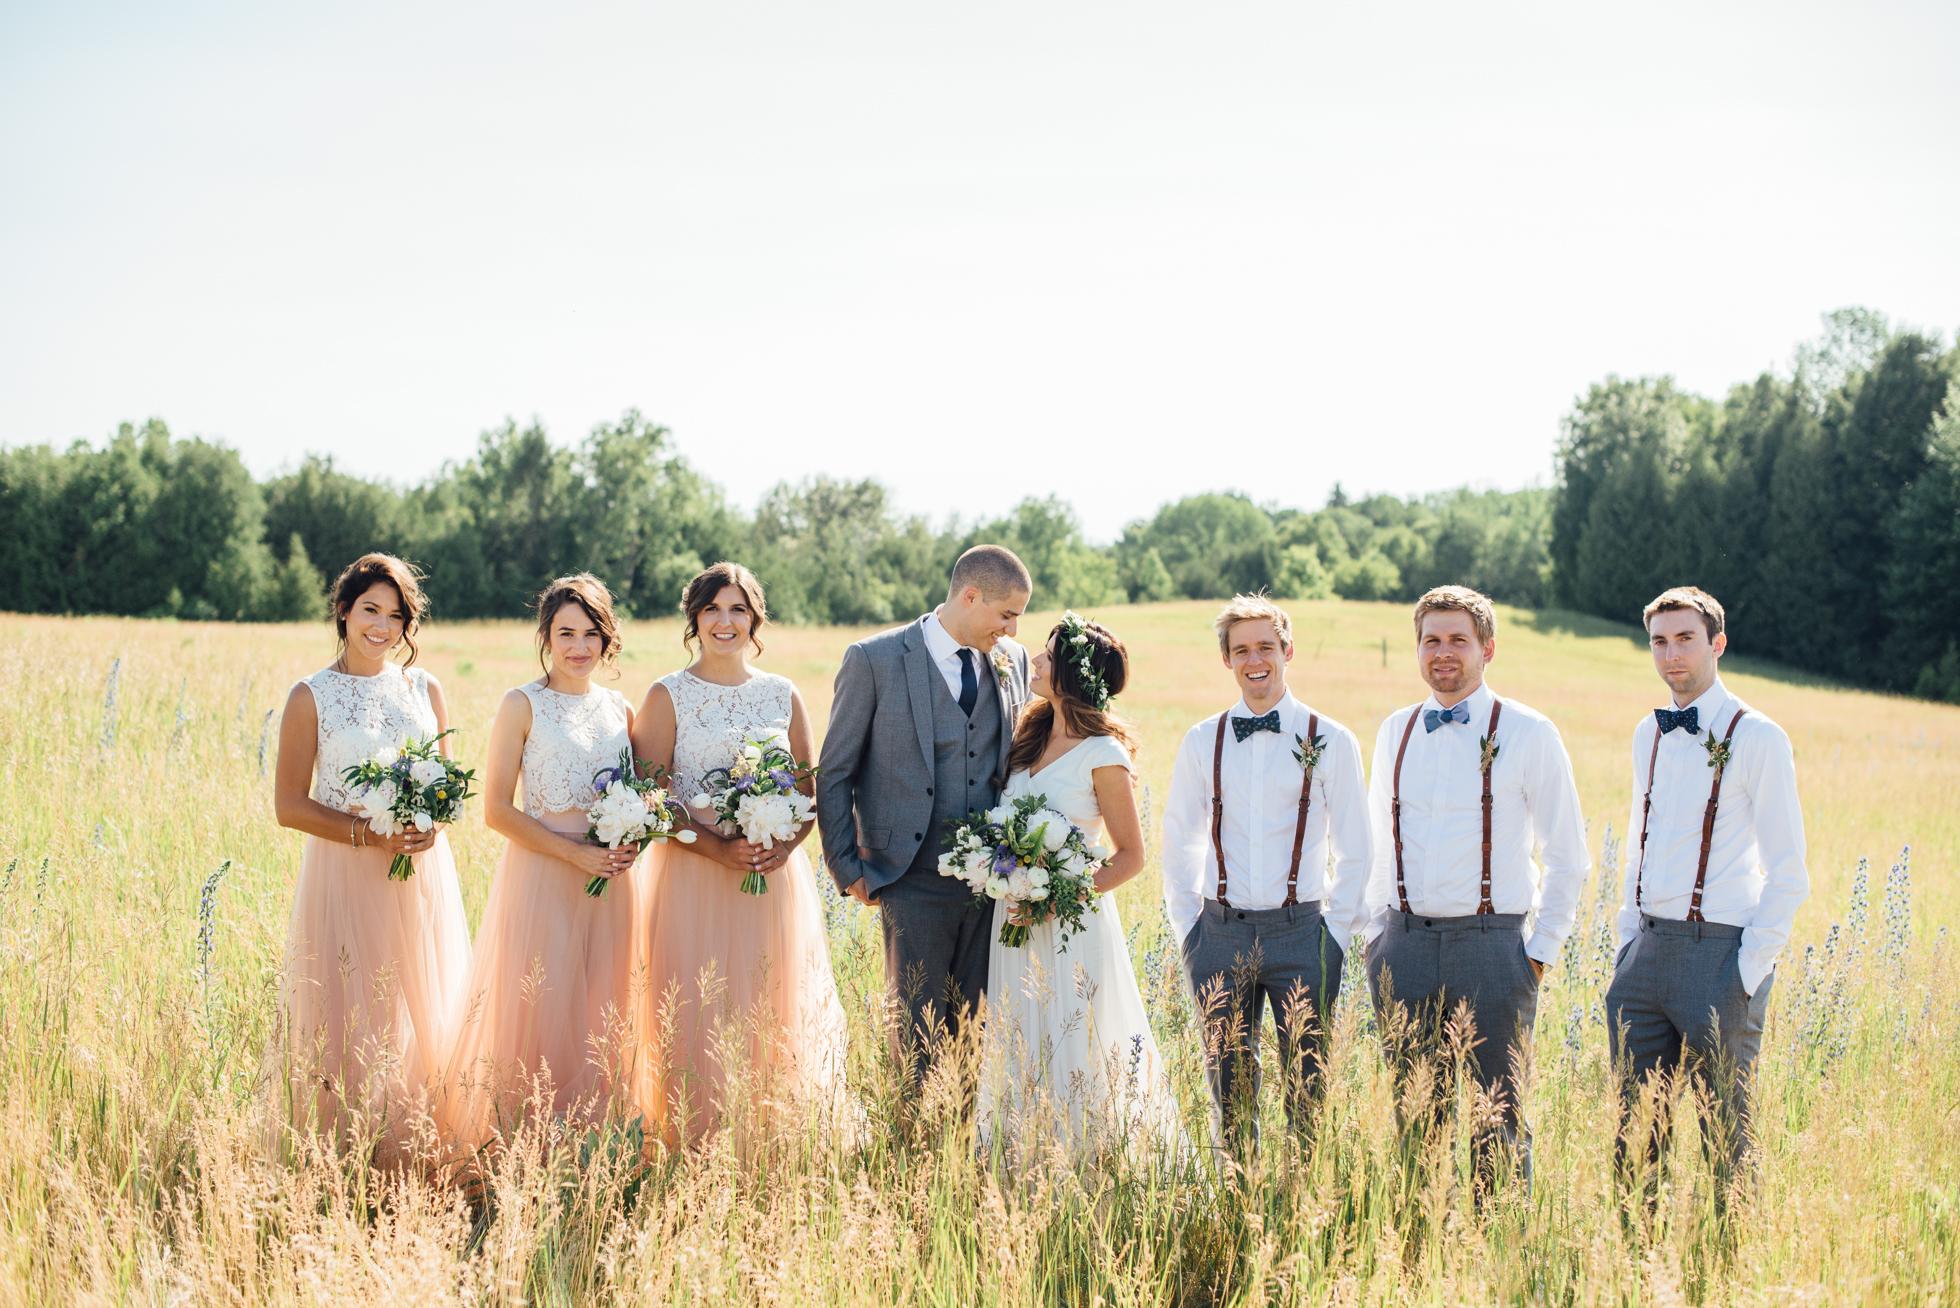 Downswell-Barn-Wedding-Photography-67.jpg